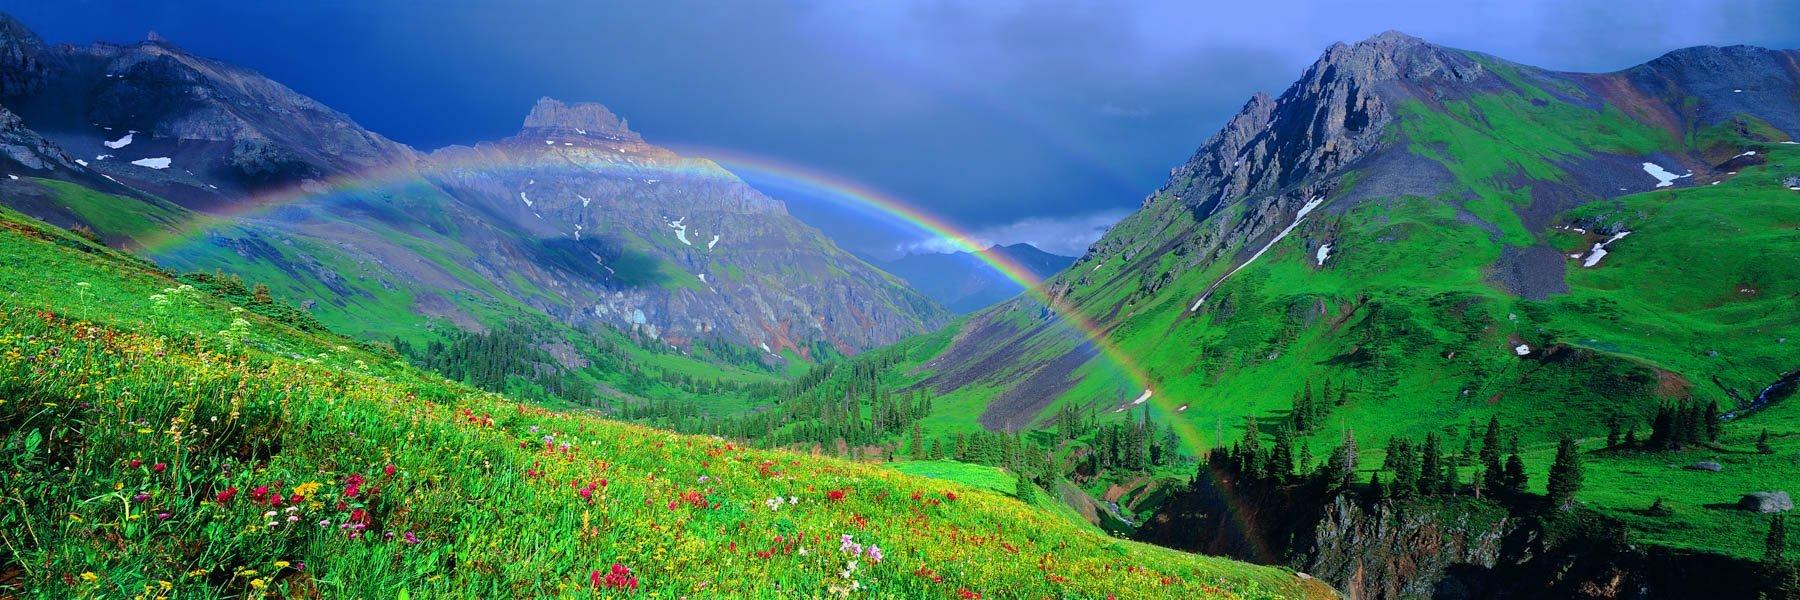 A double rainbow over the mountains near Vale, Colorado, USA.